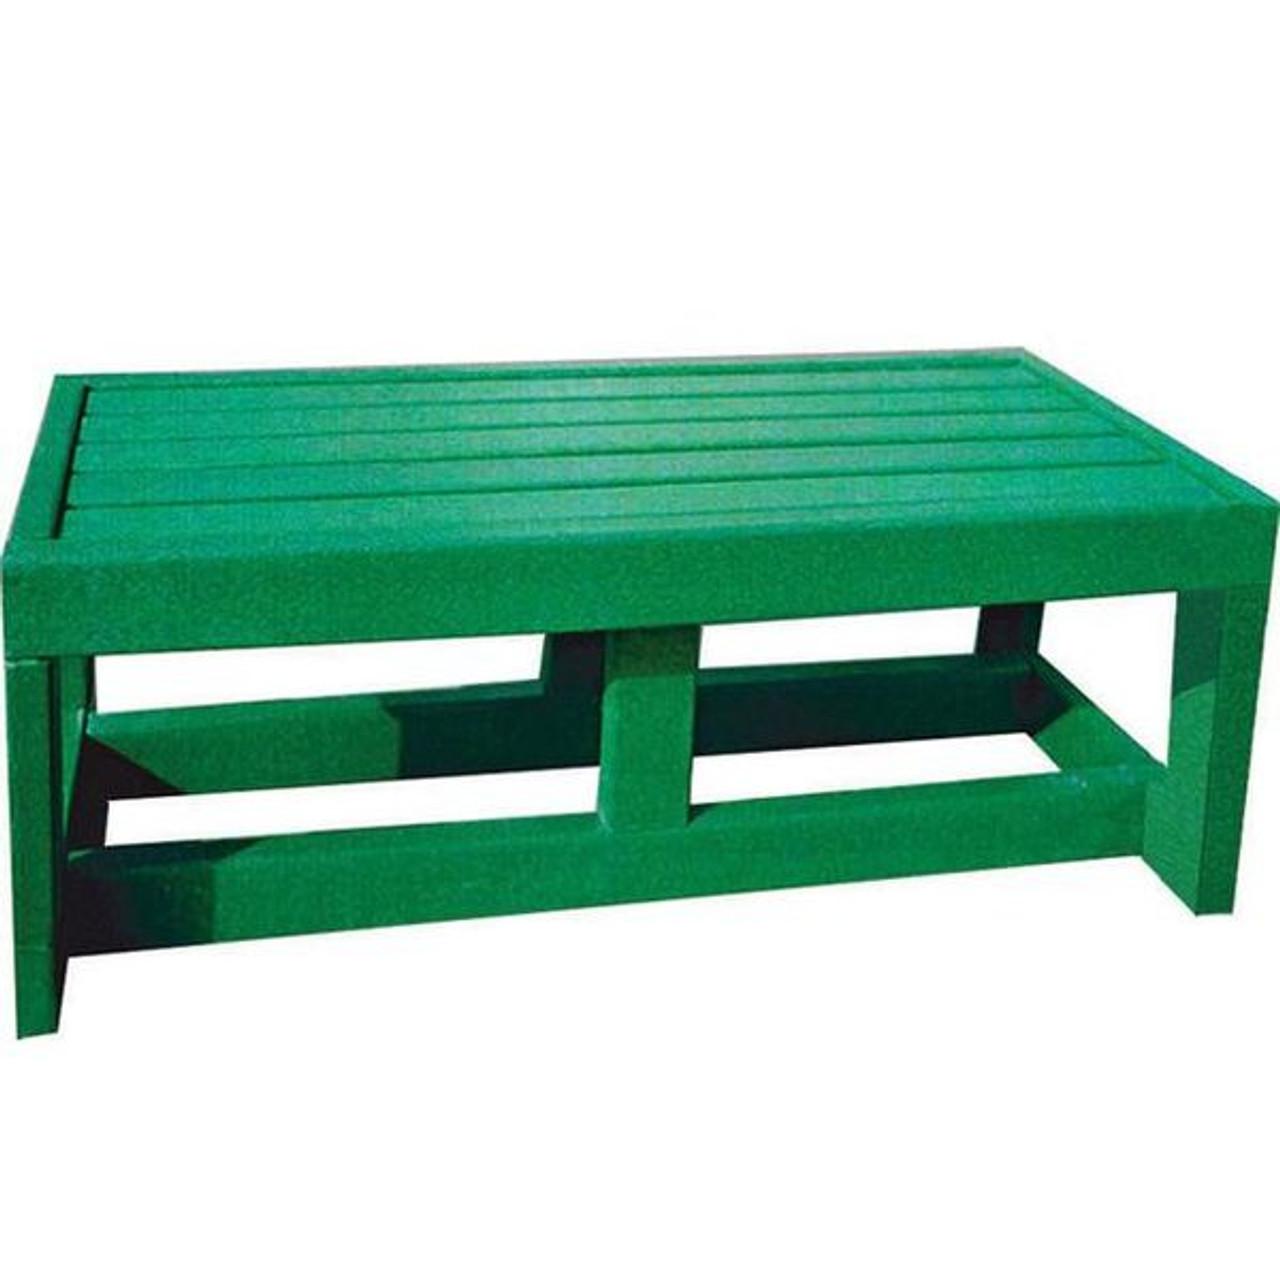 Cool Durawood Dent Saver Bench 5 L Lamtechconsult Wood Chair Design Ideas Lamtechconsultcom